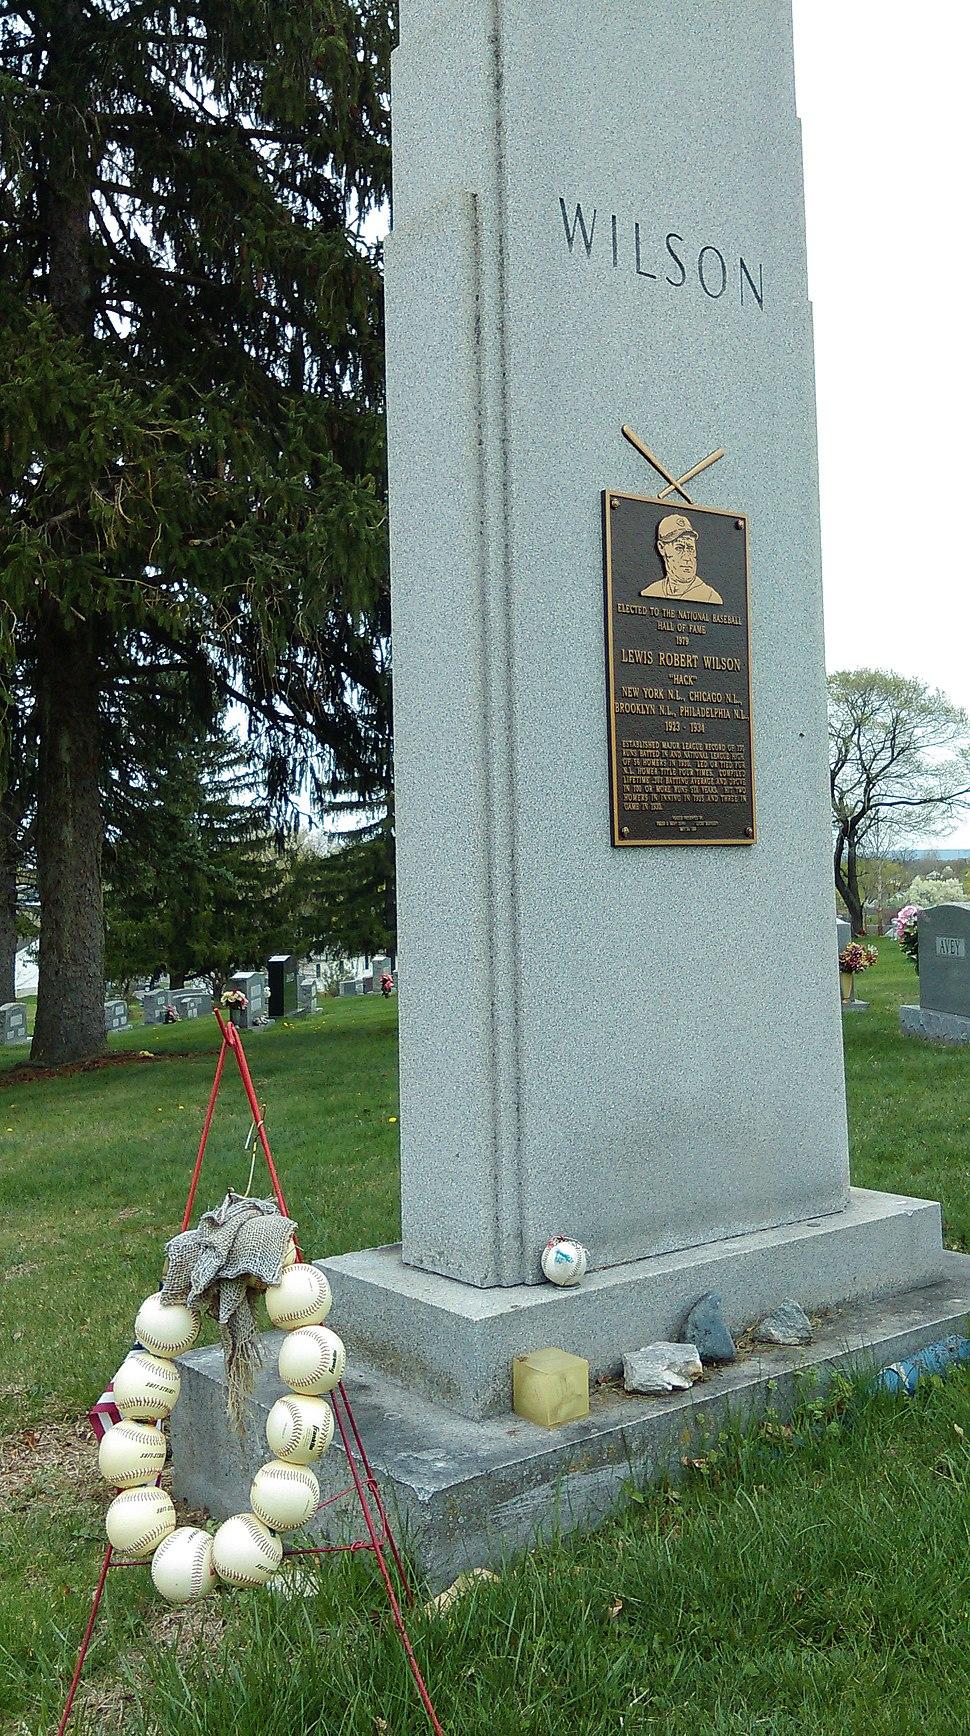 Hack Wilson's gravestone, Martinsburg, WV